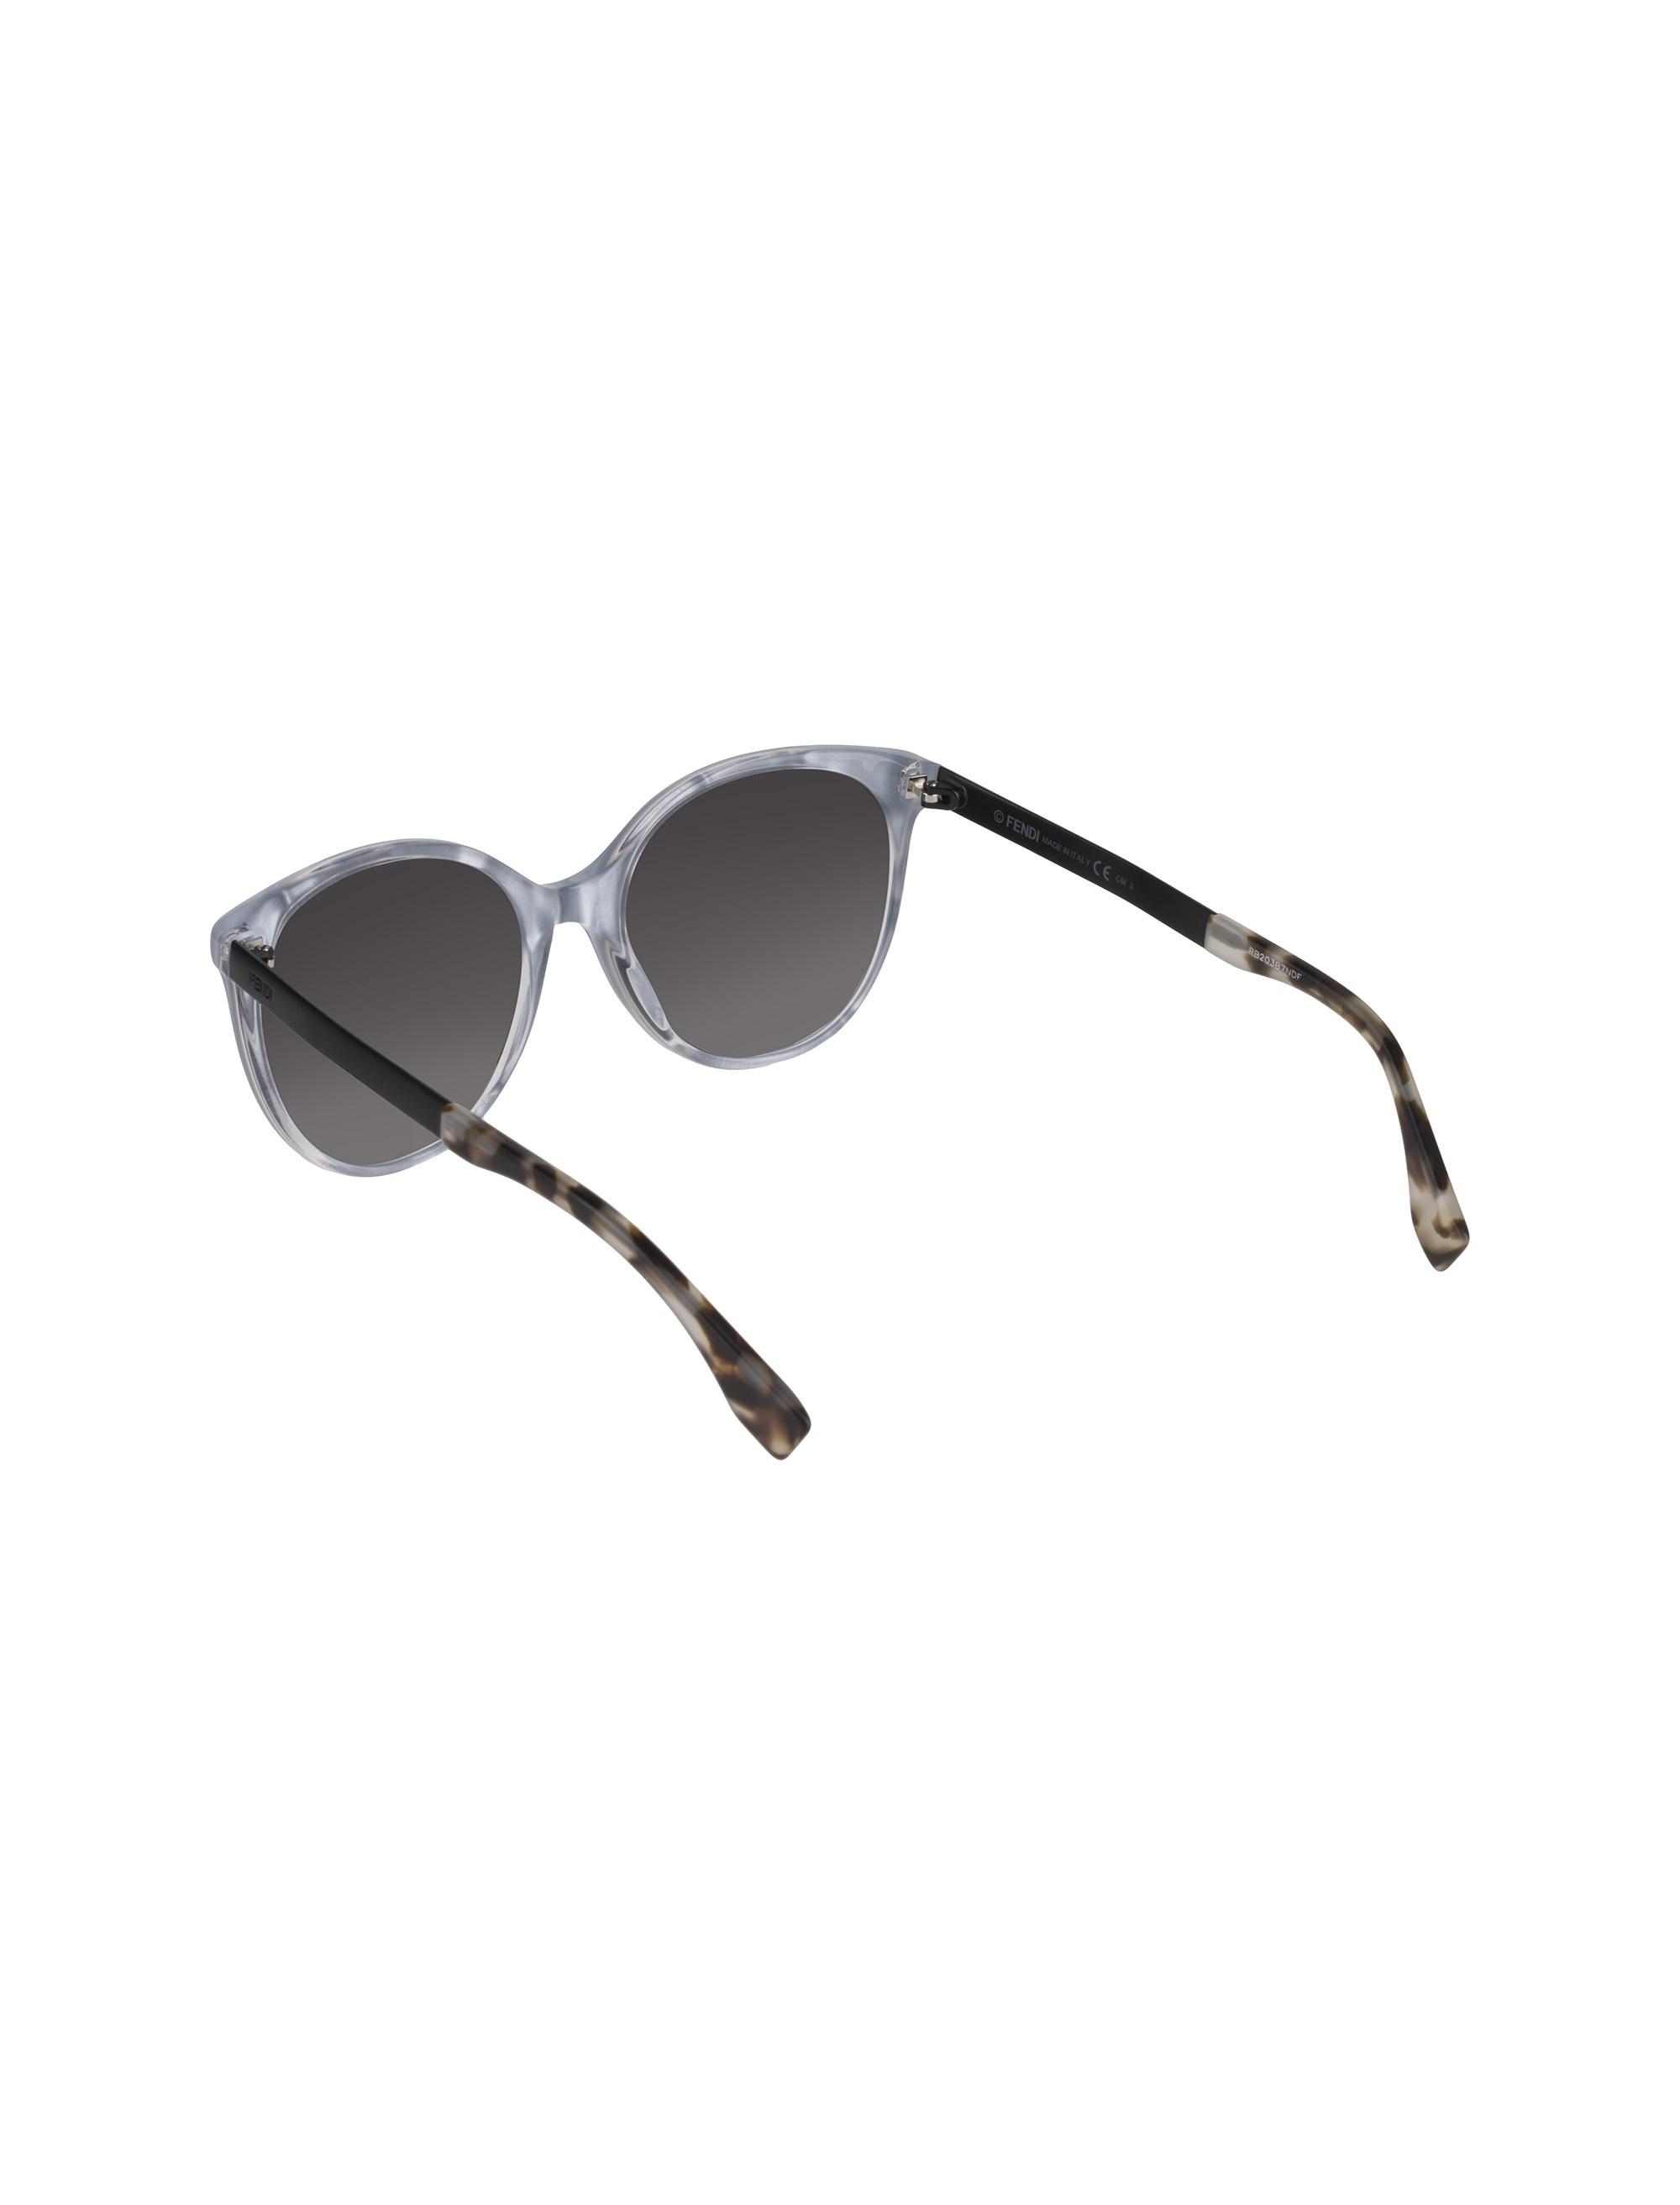 عینک آفتابی پنتوس زنانه - فندی